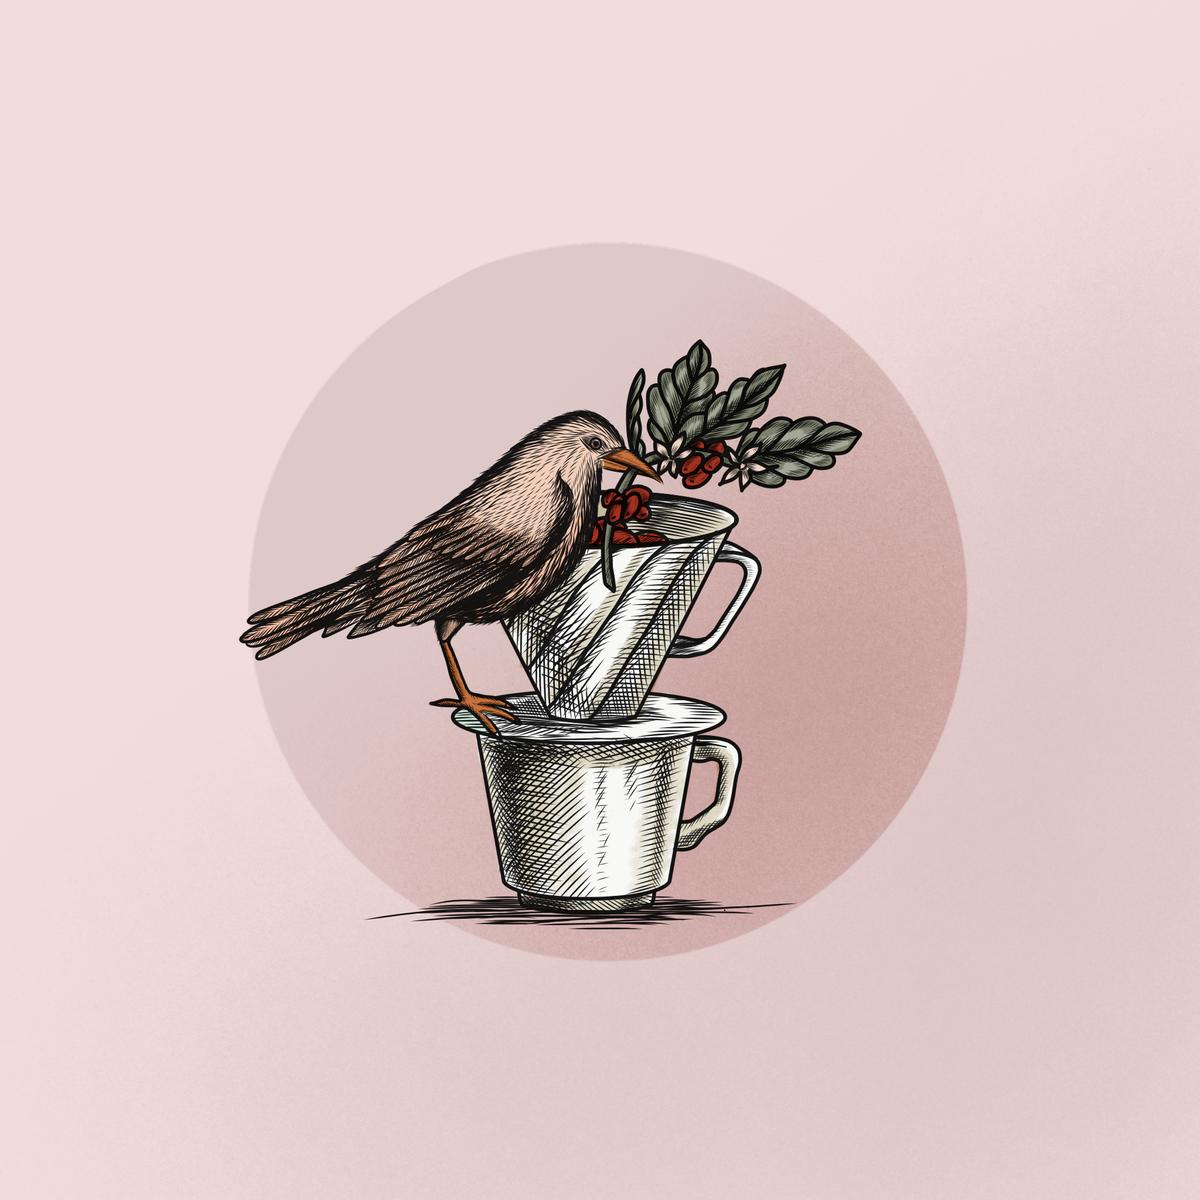 Harvests Coffee illustrations